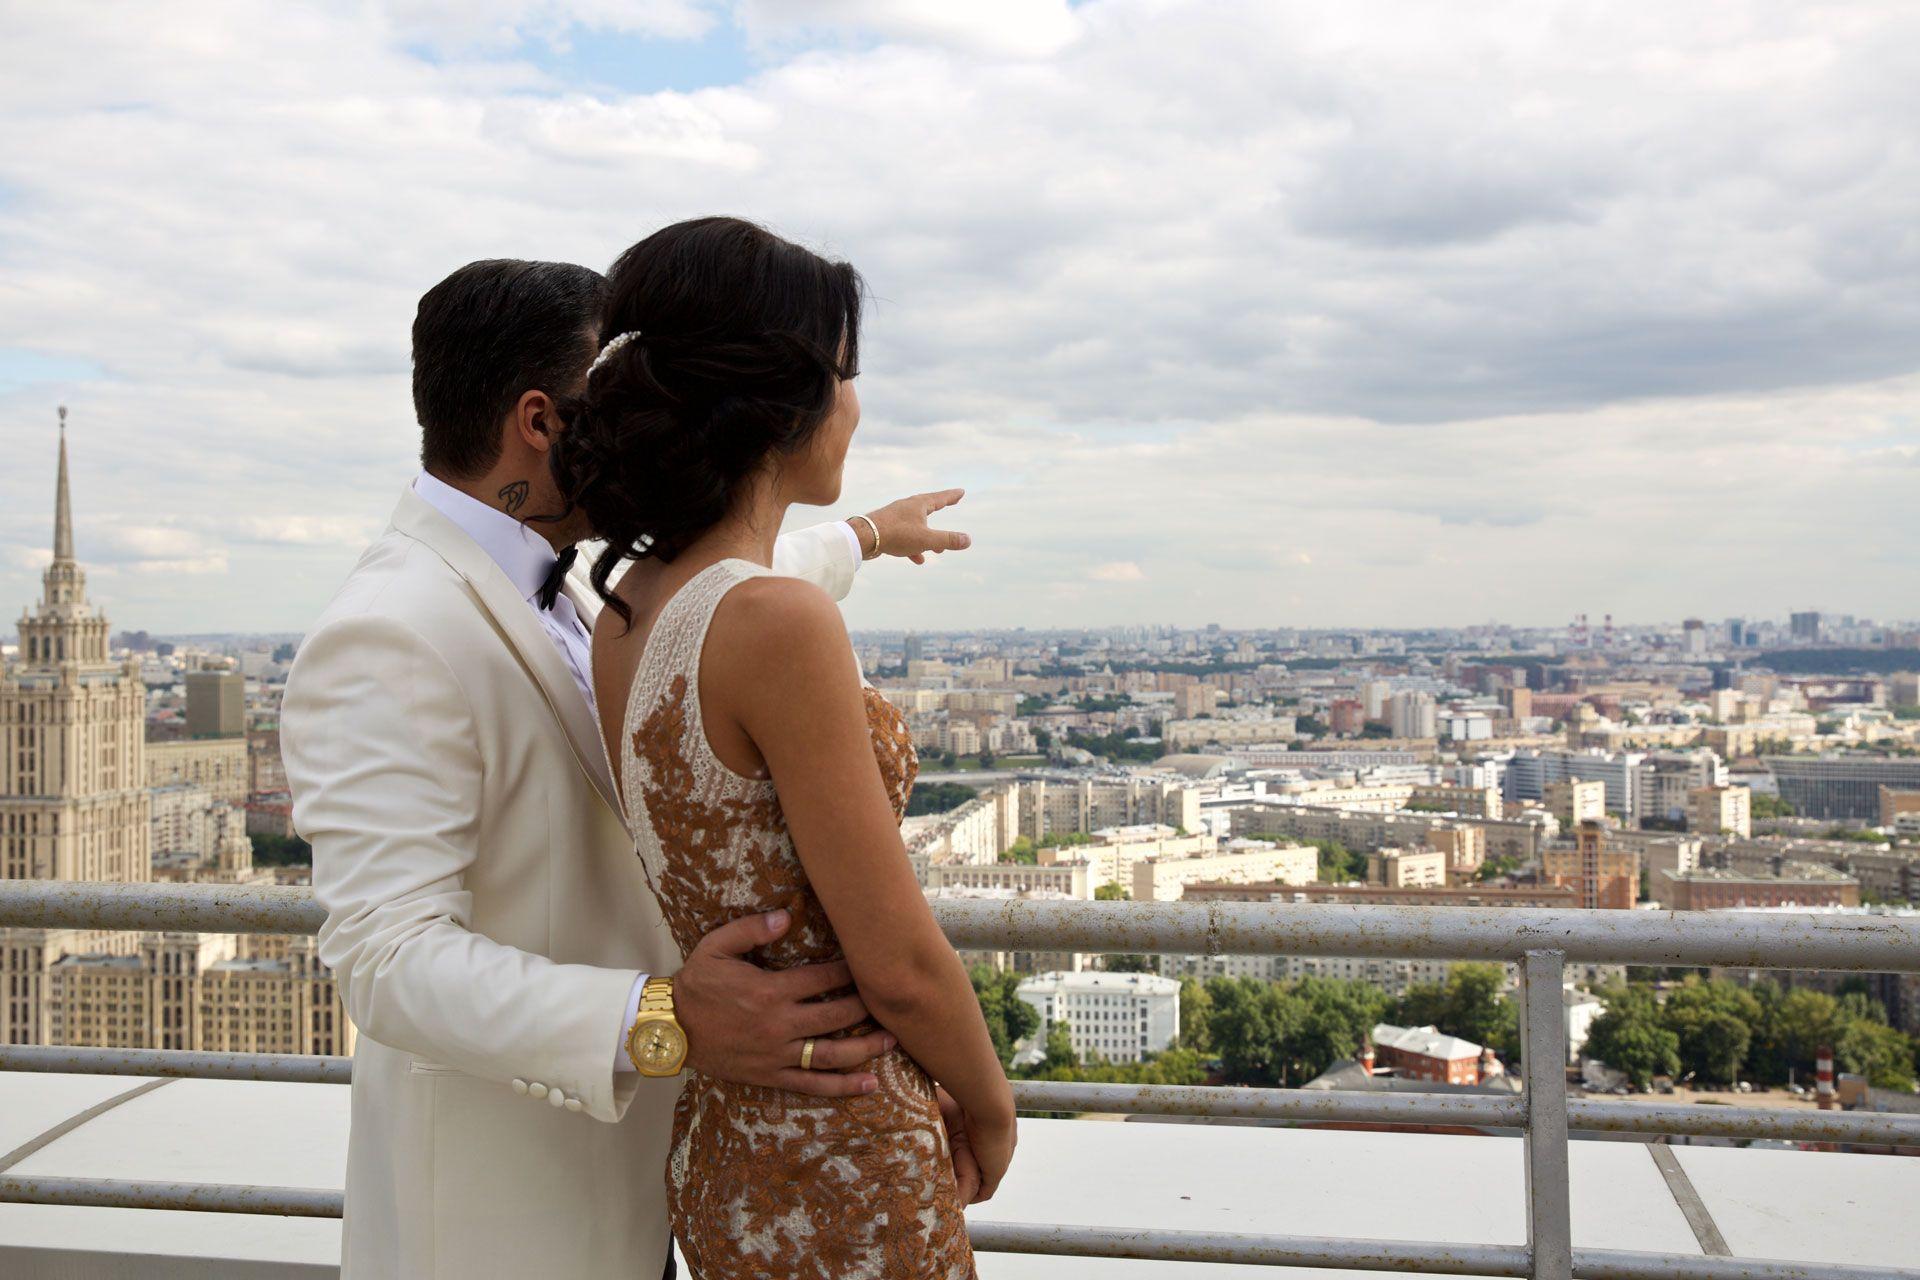 Открытие площадки с панорамным видом на Москву, фото 4